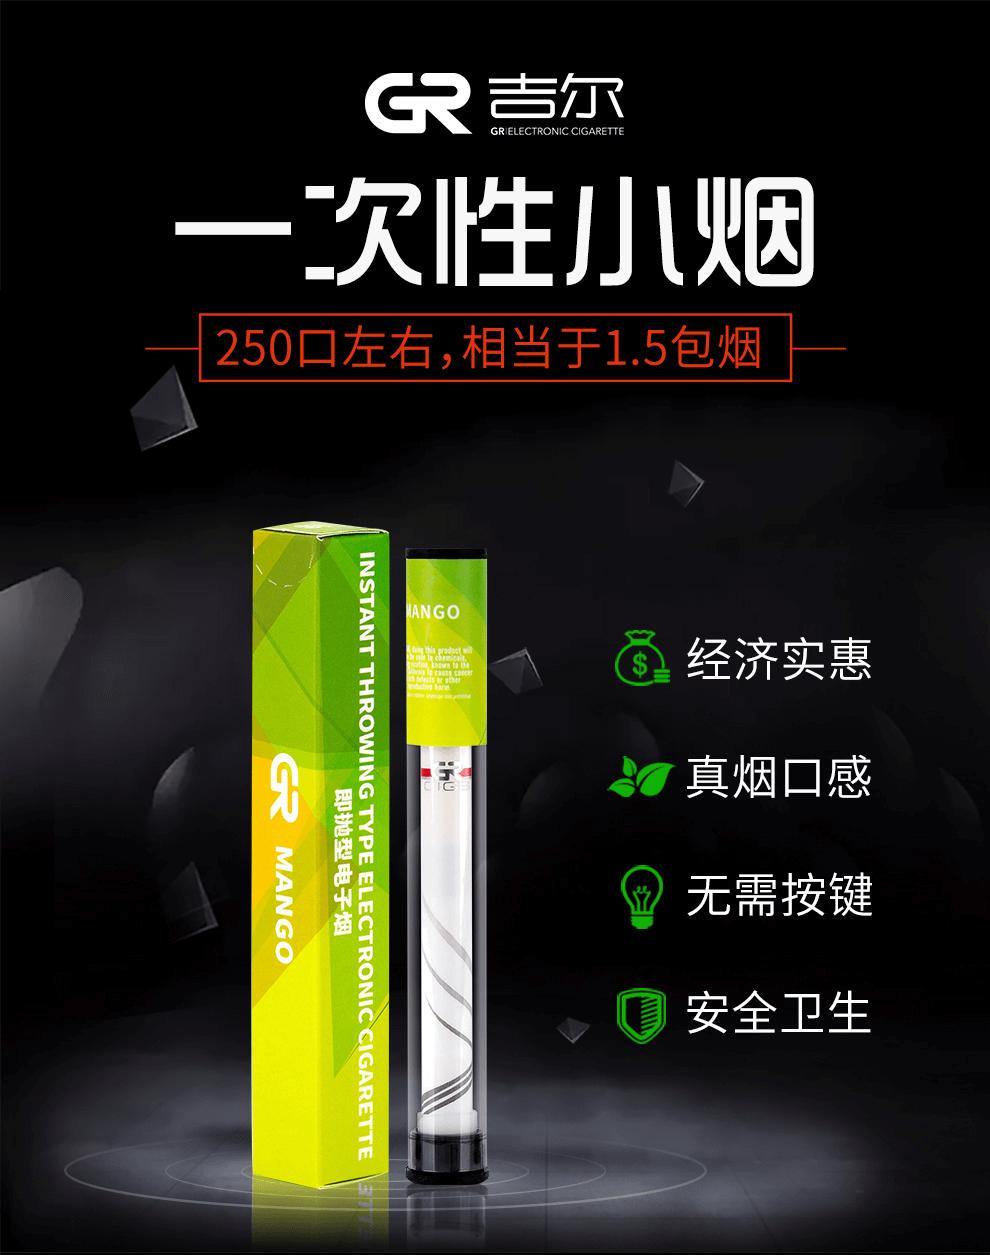 一次性电子烟整_01.png